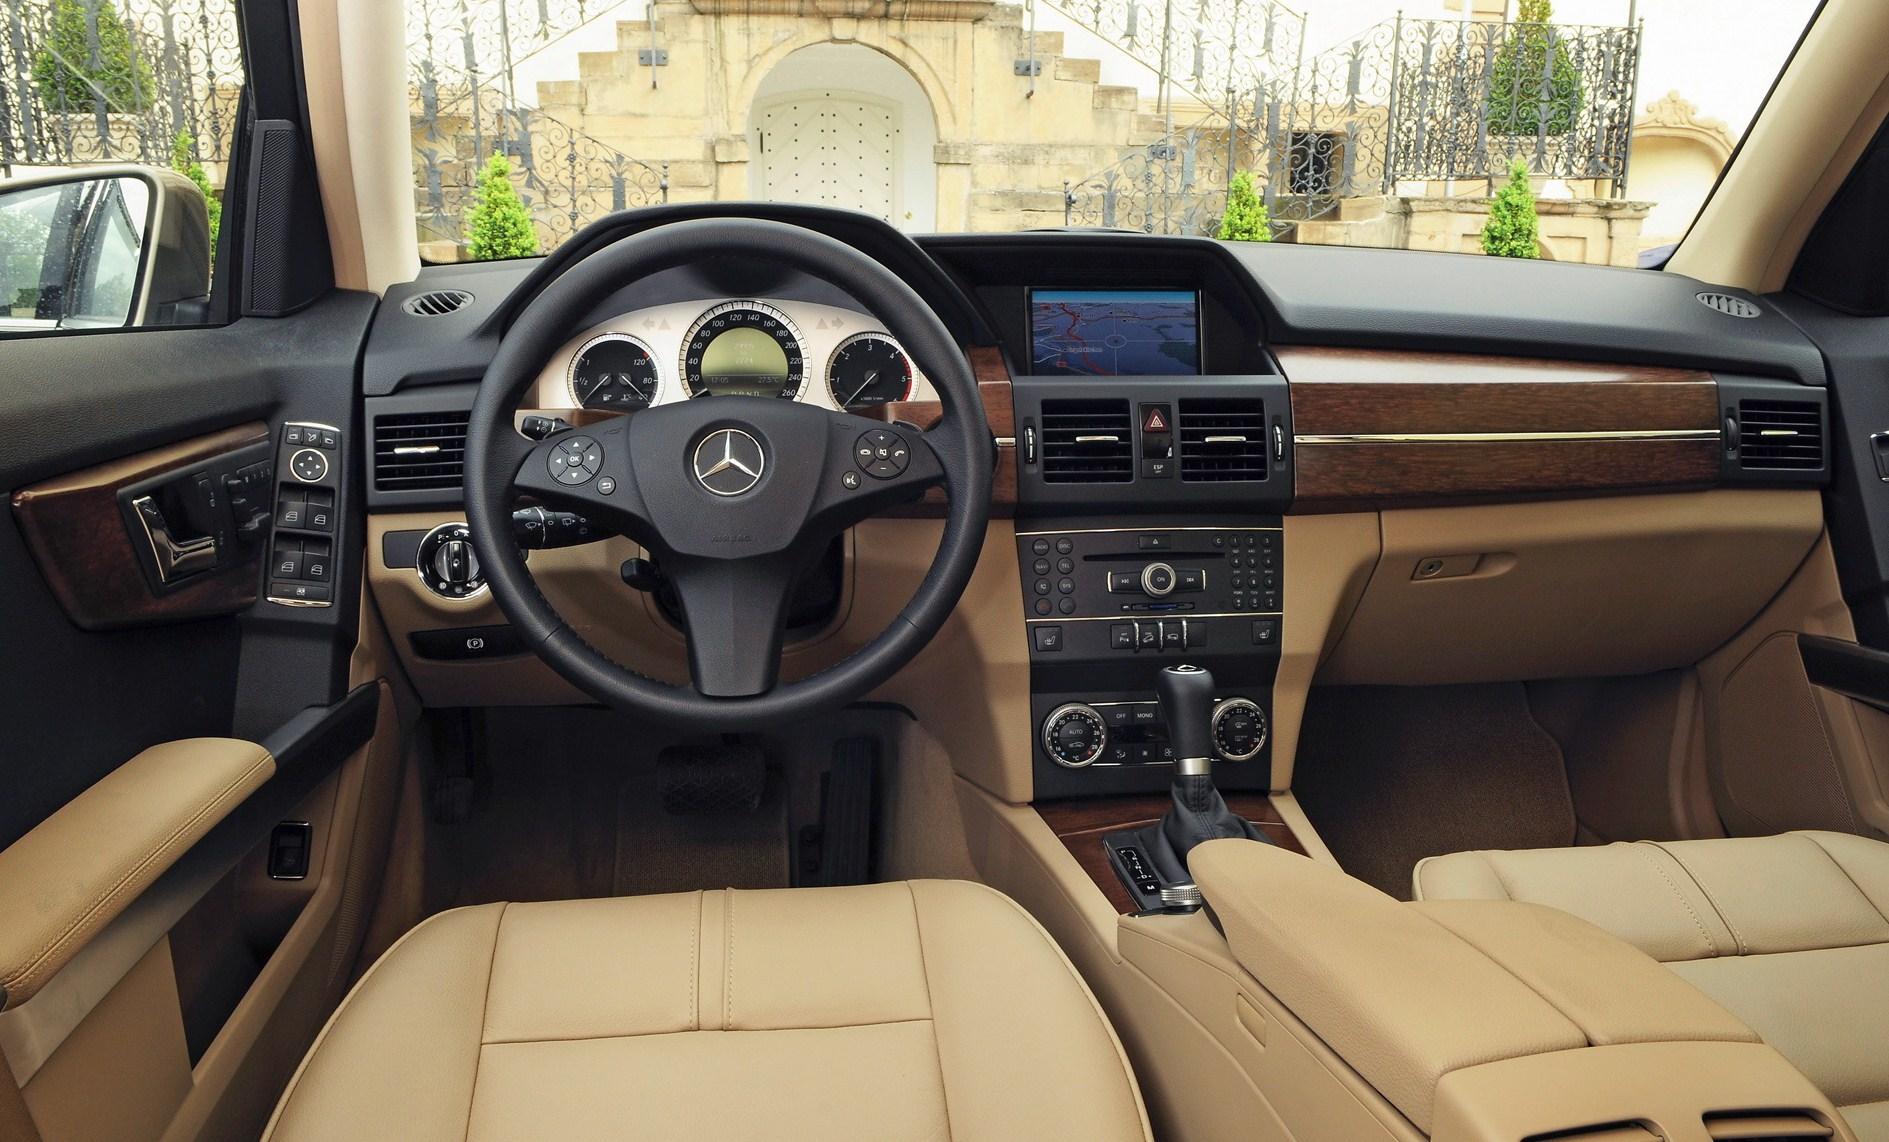 Mercedes Benz GLK 320 Image 6